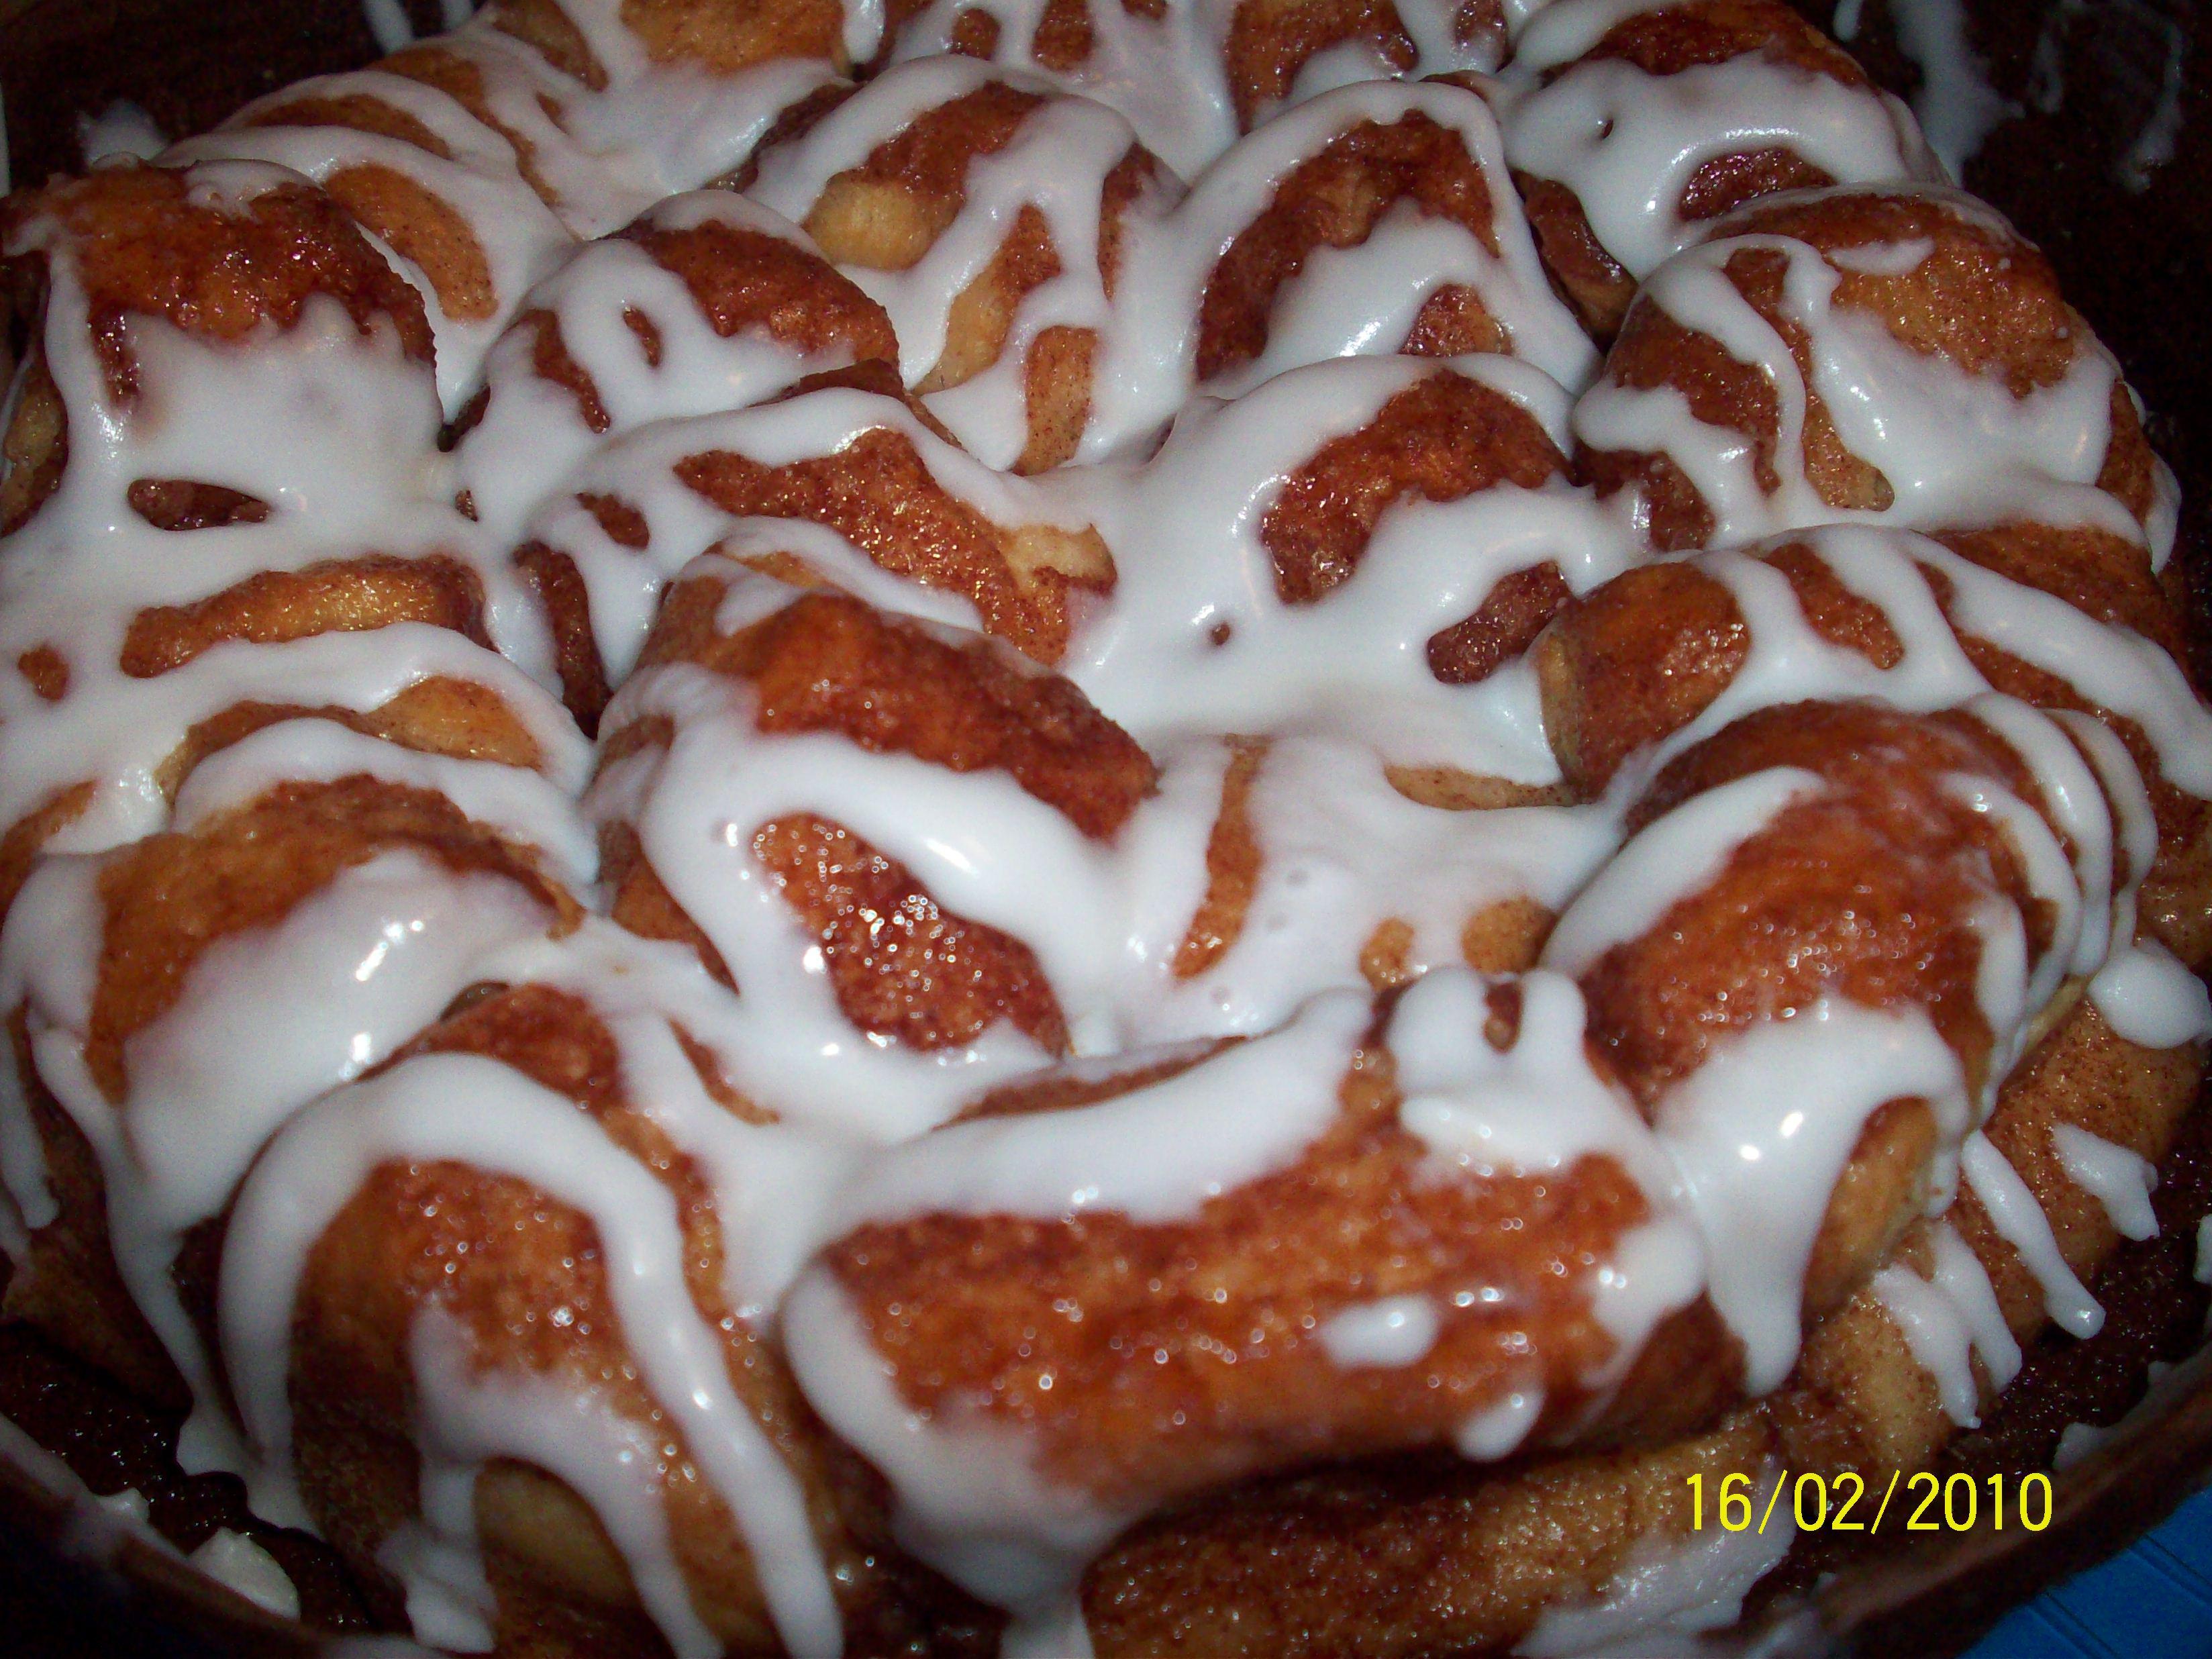 http://foodloader.net/cutie_2010-02-16_KFCs_Cinnamon_Pull-a-Parts.jpg